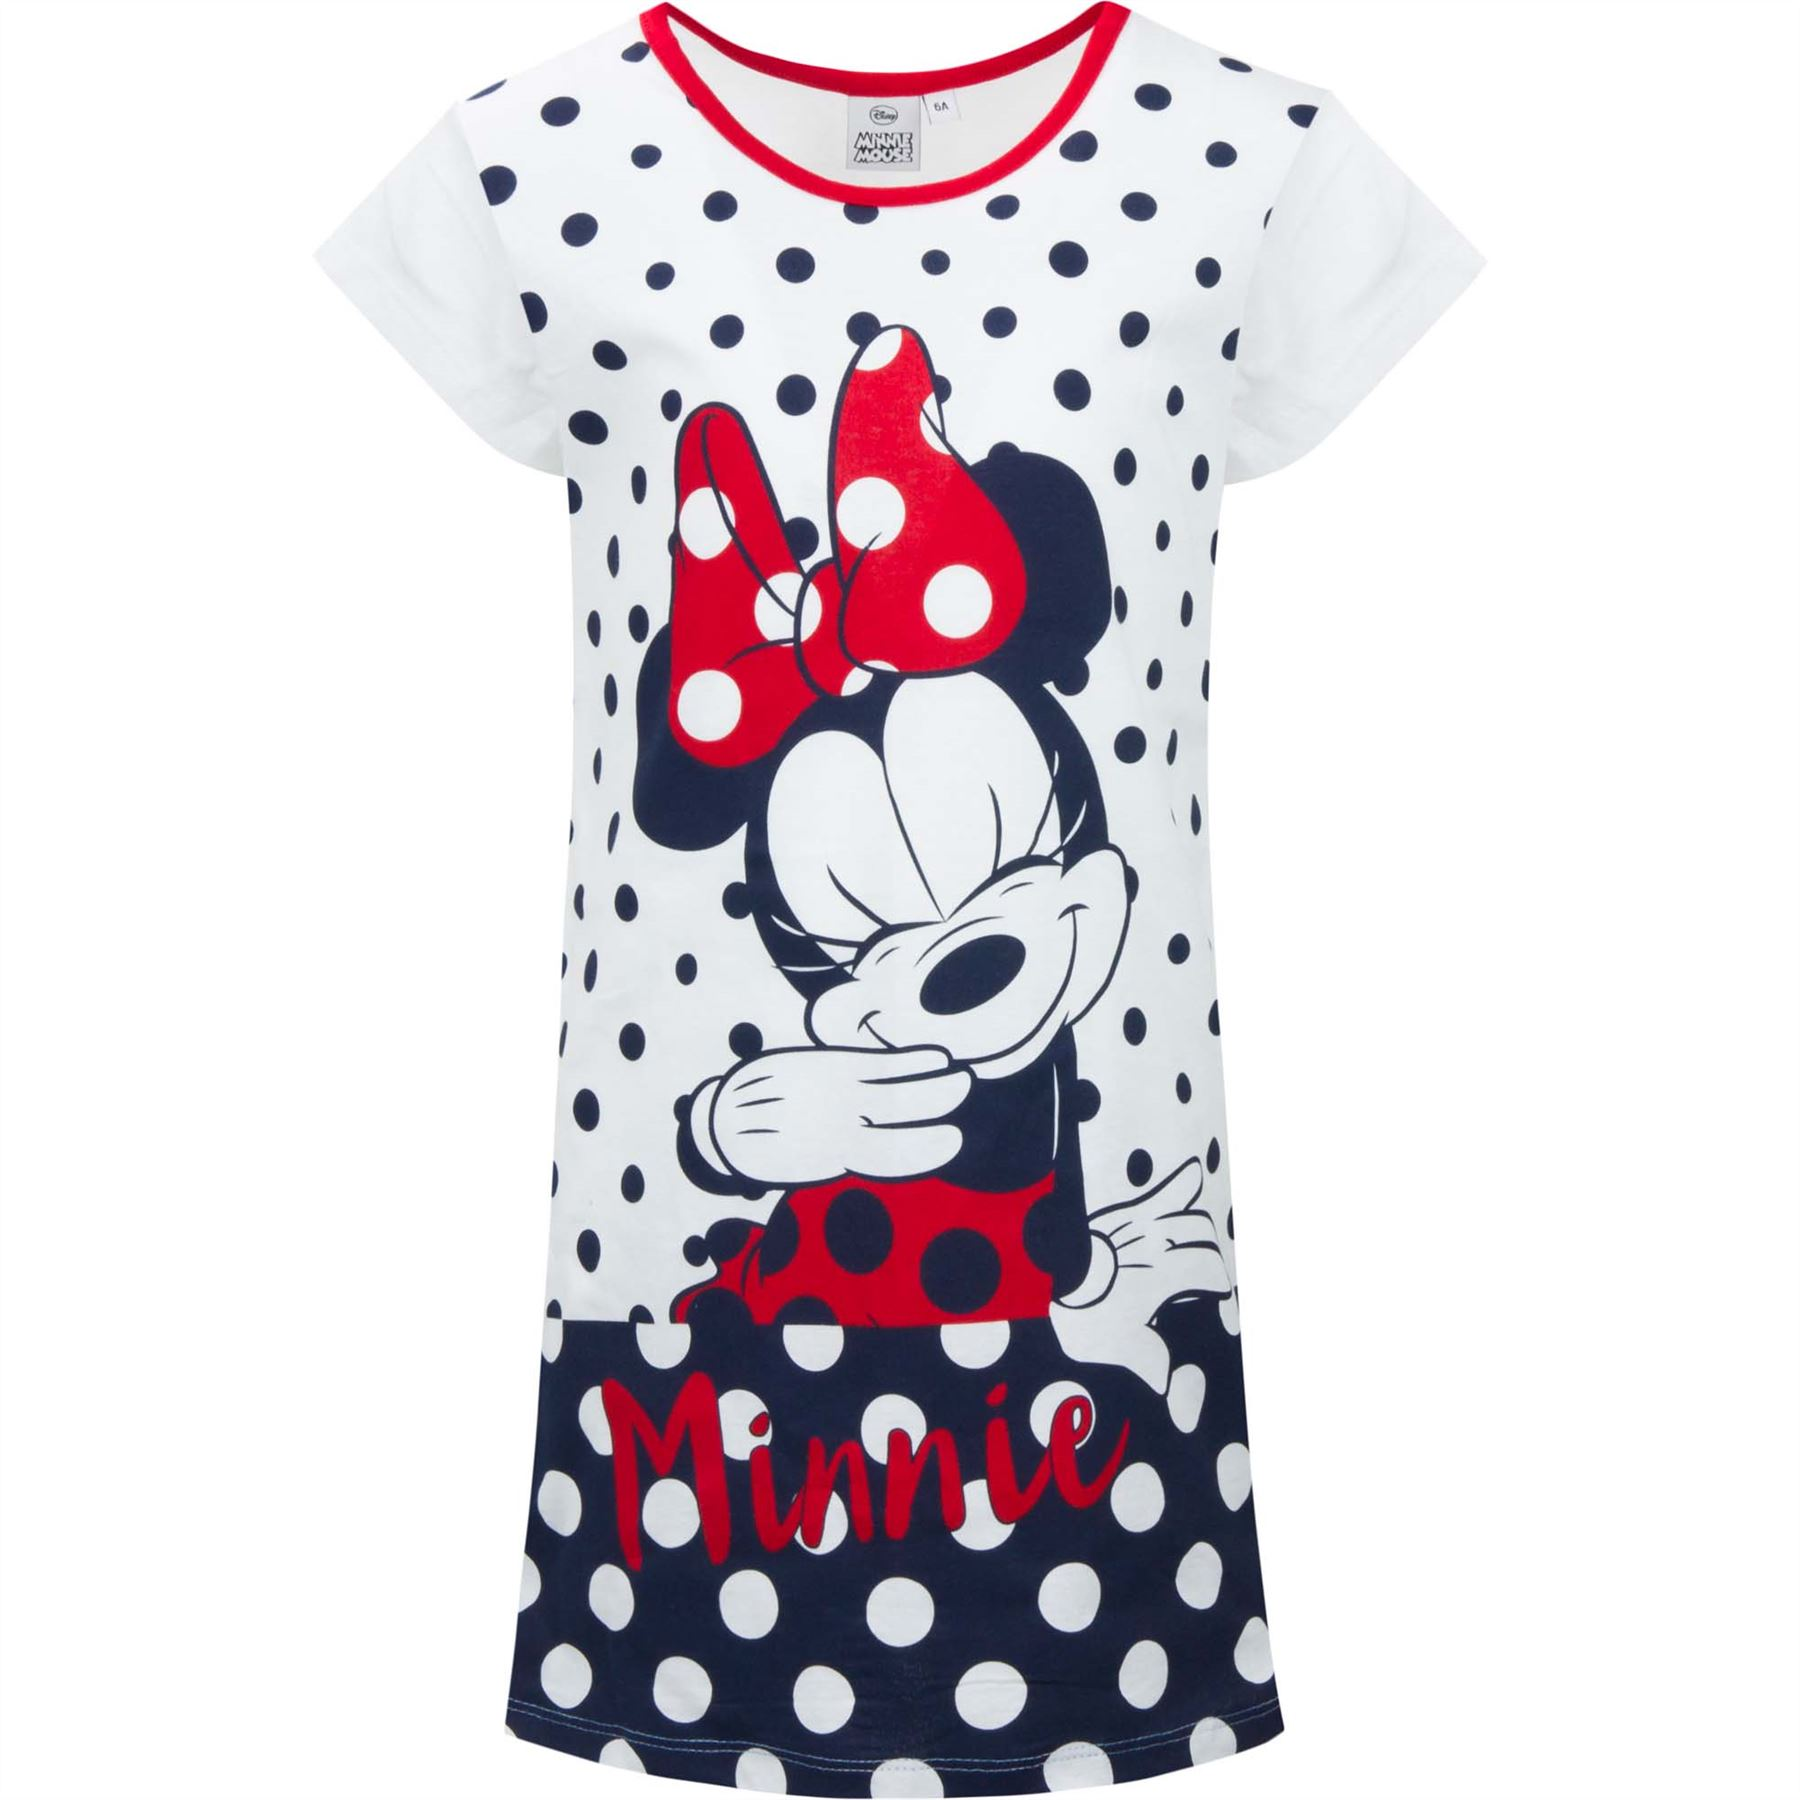 Minnie Mouse Bambina Camicia da Notte